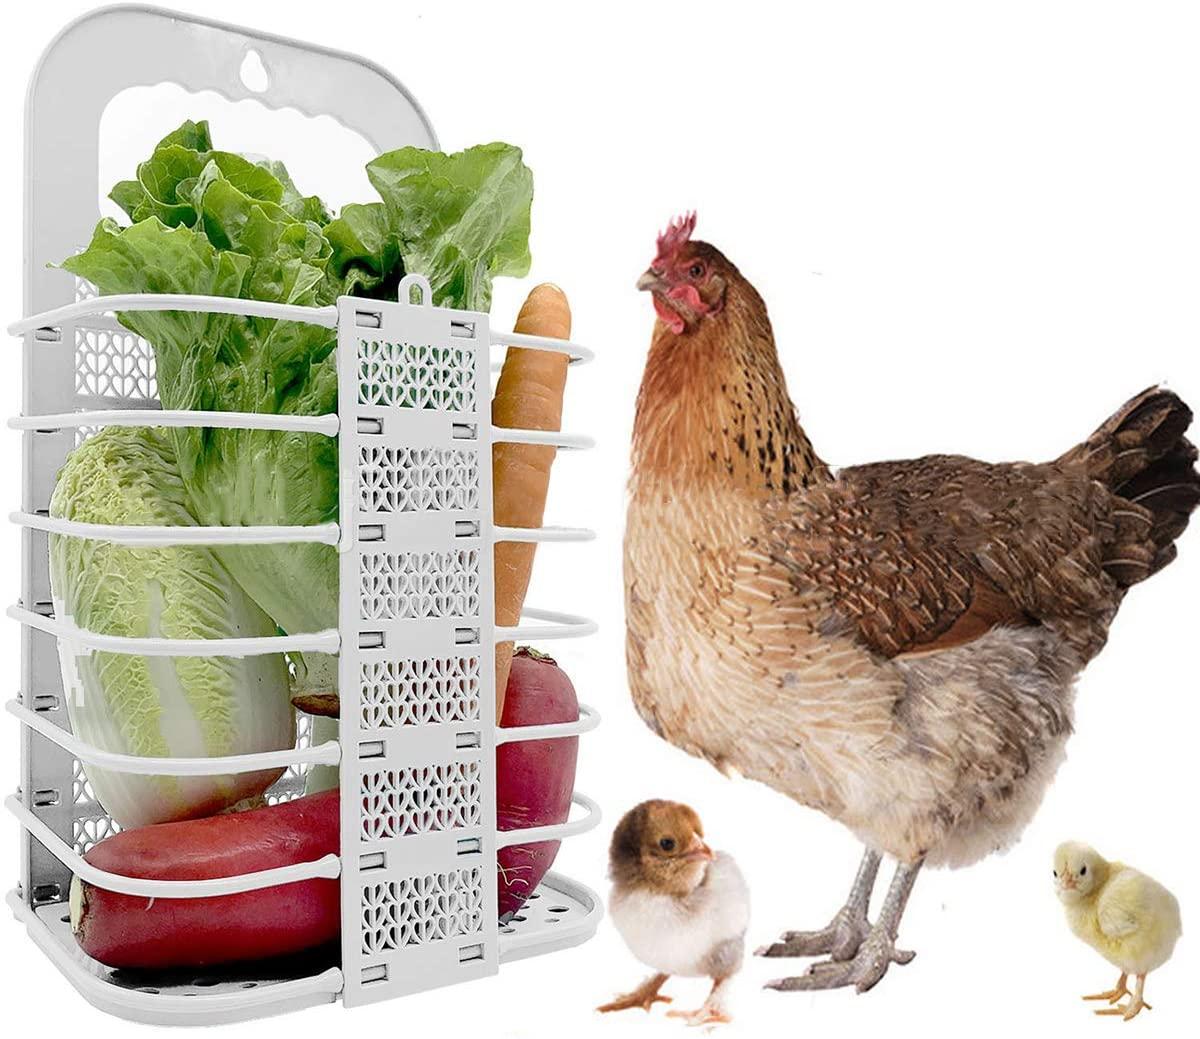 Chicken Vegetable Basket Folding Veggie Ball Fruit Veggie Hanging Feeder for Hens Chicken Coop